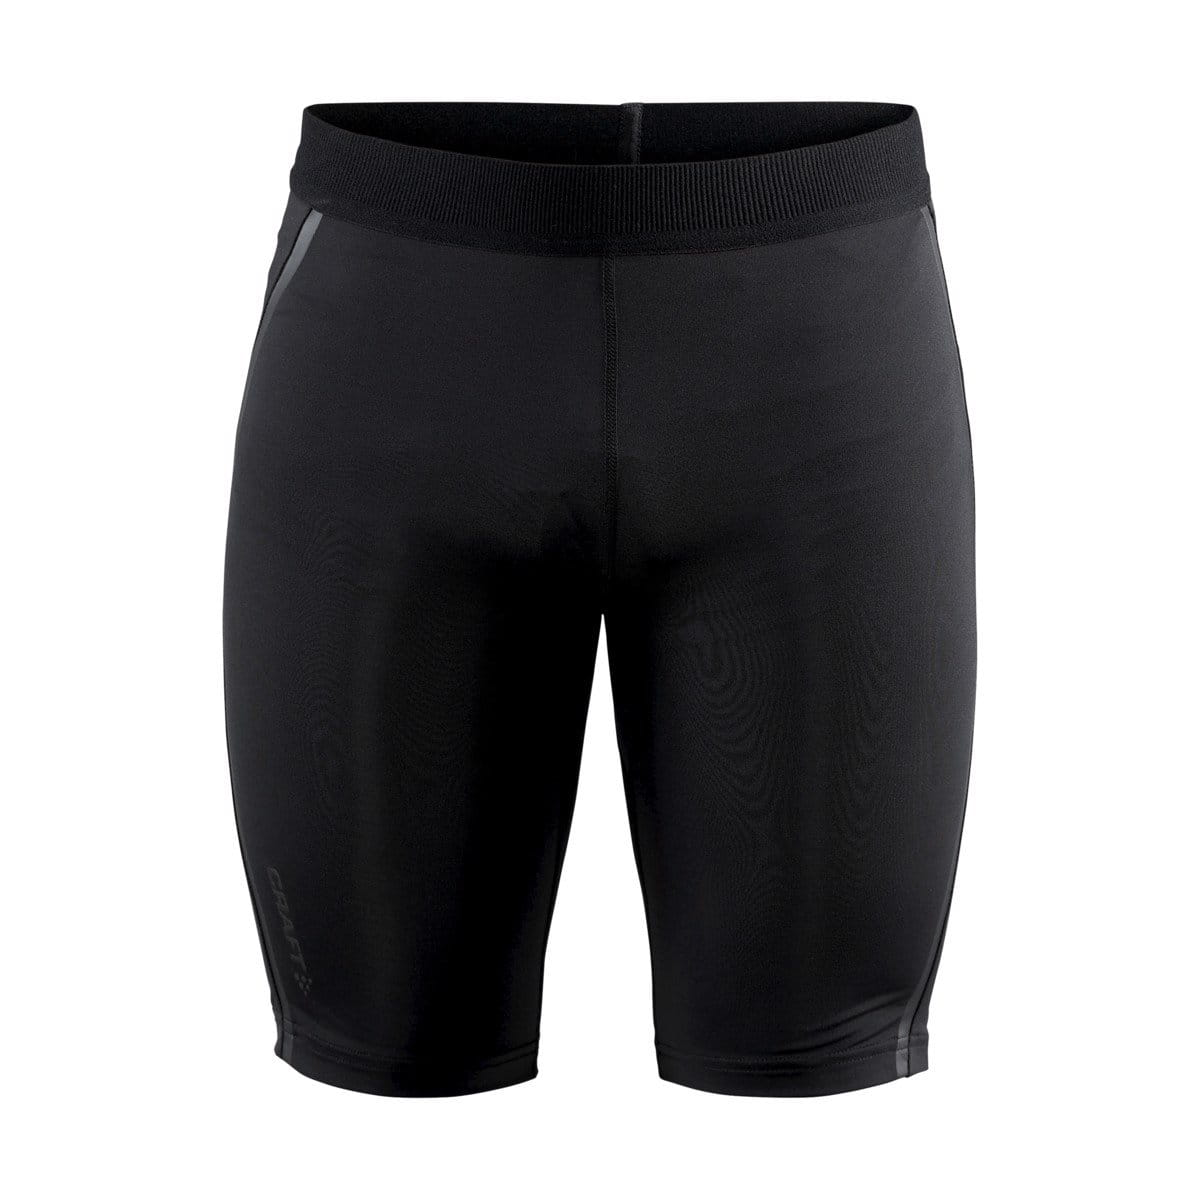 Kraťasy Craft Kalhoty Vent krátké černá